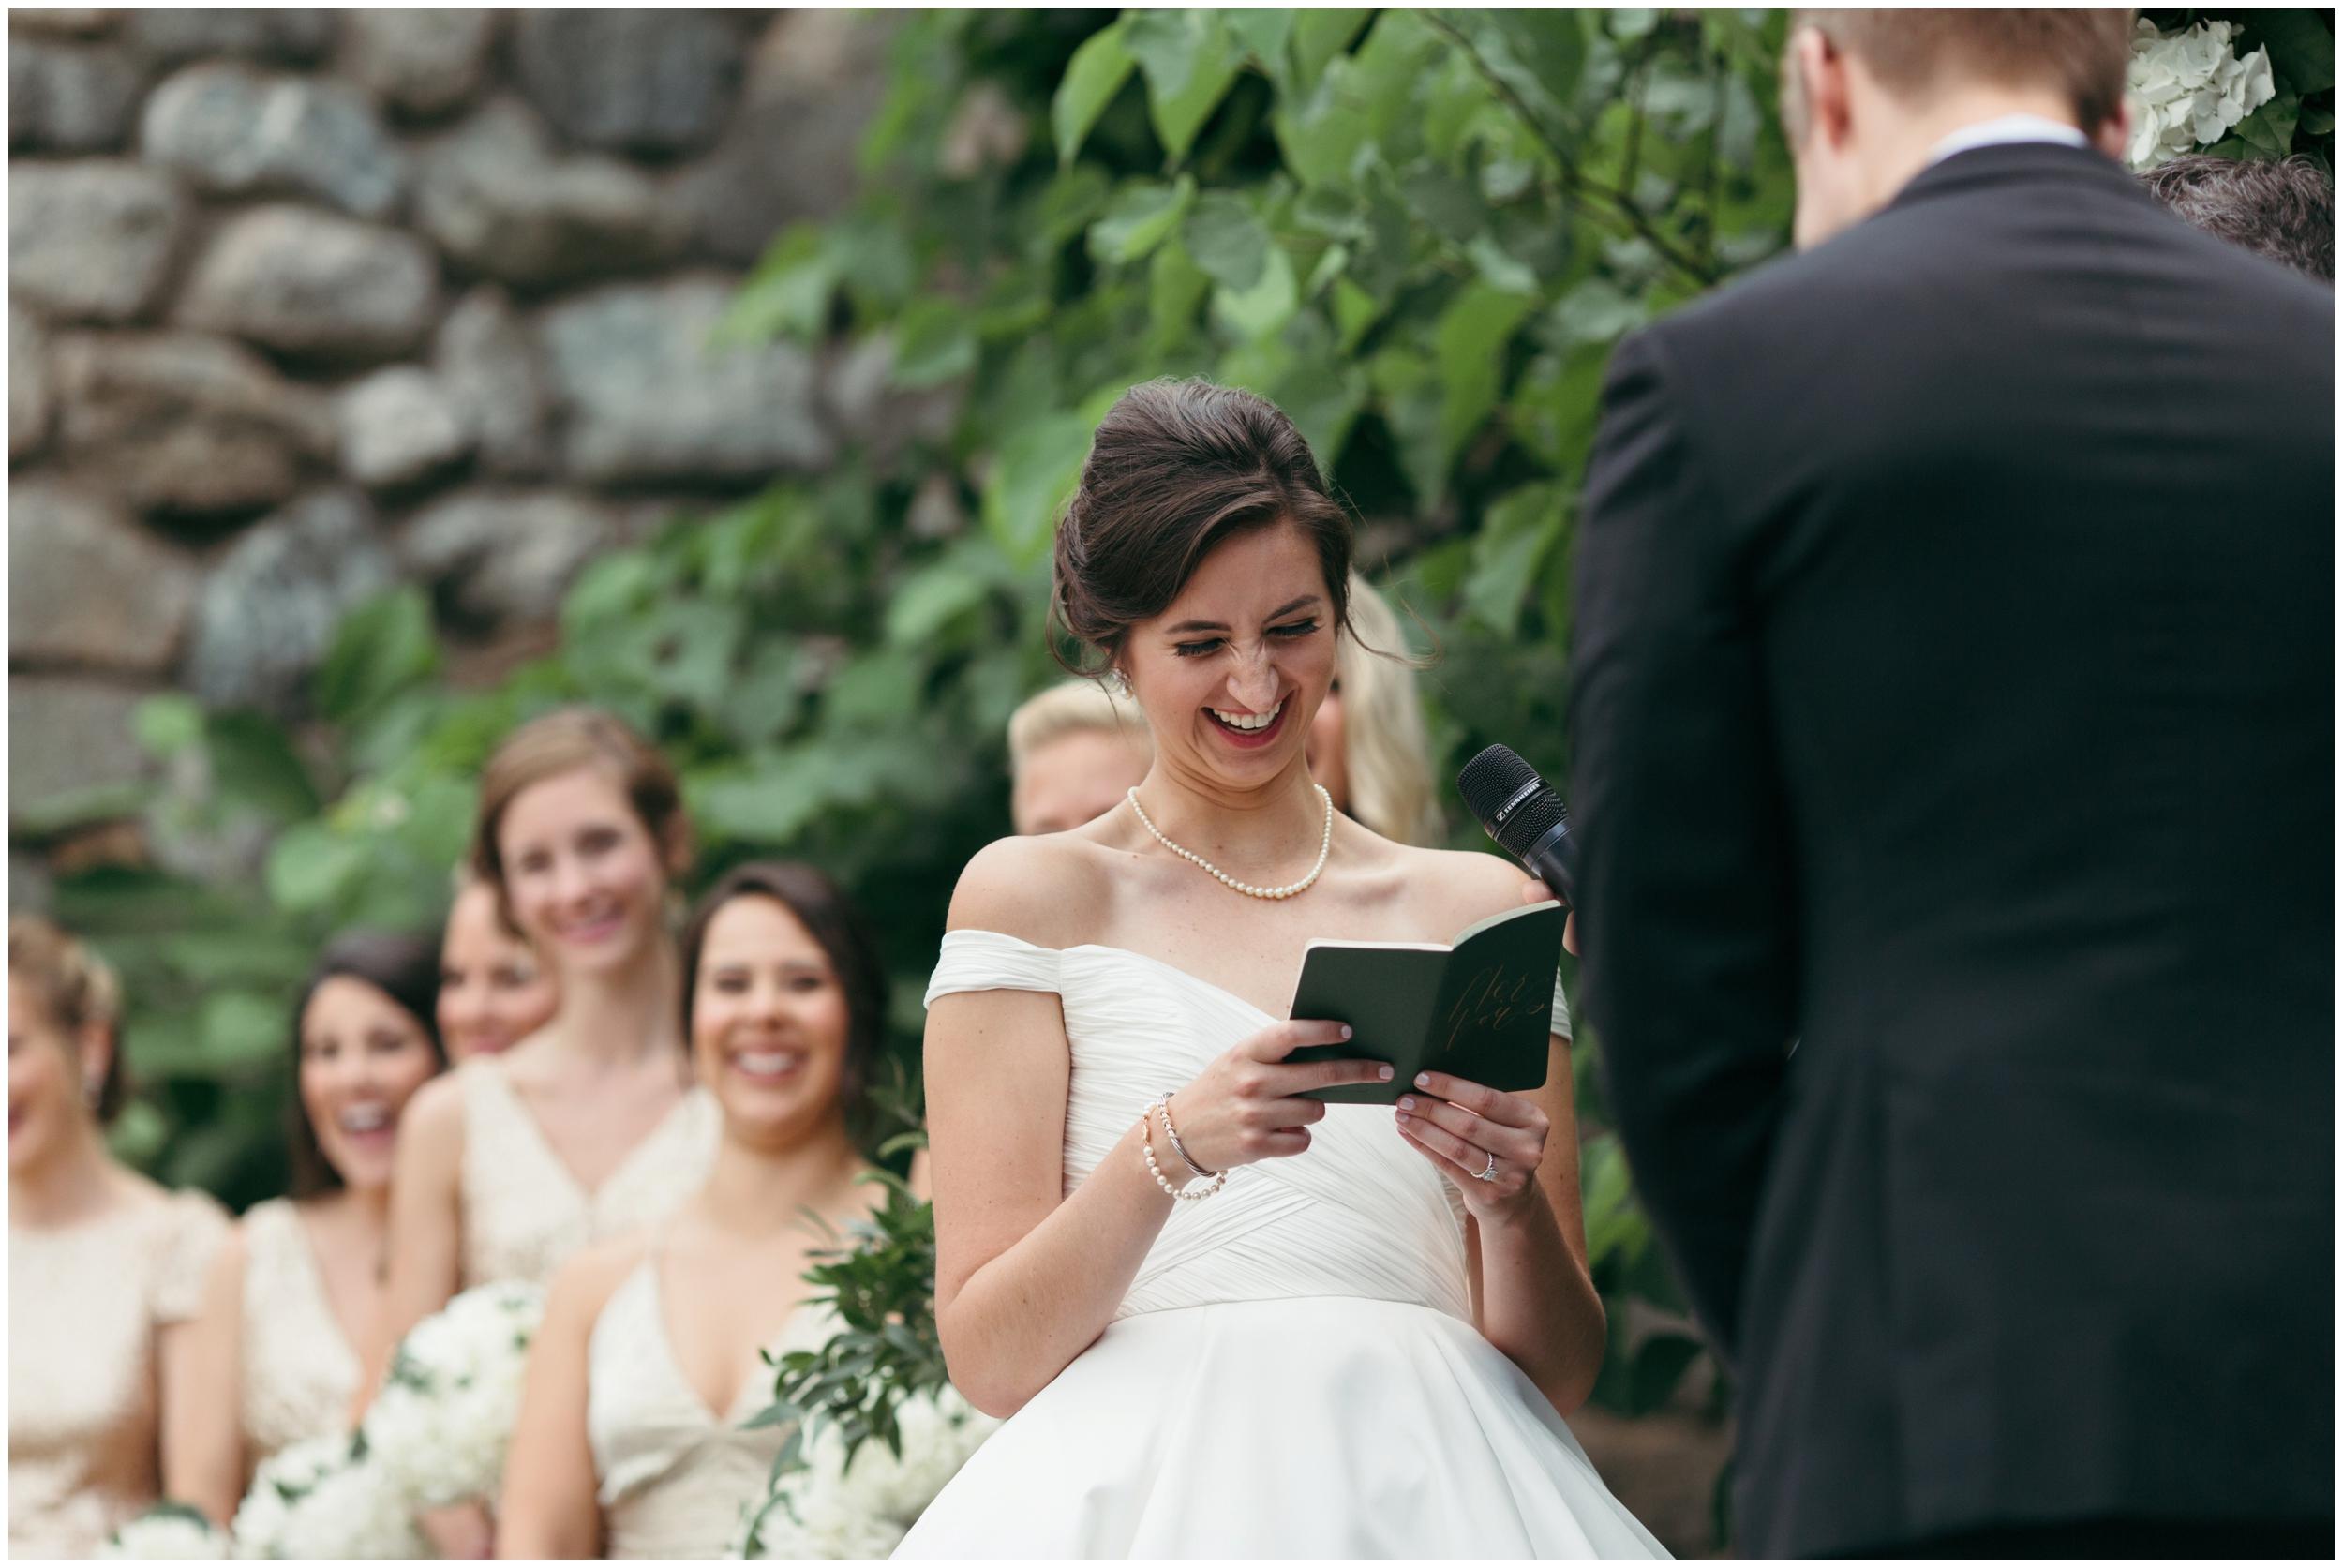 Willowdale-Estate-Wedding-Bailey-Q-Photo-Boston-Wedding-Photographer-038.JPG